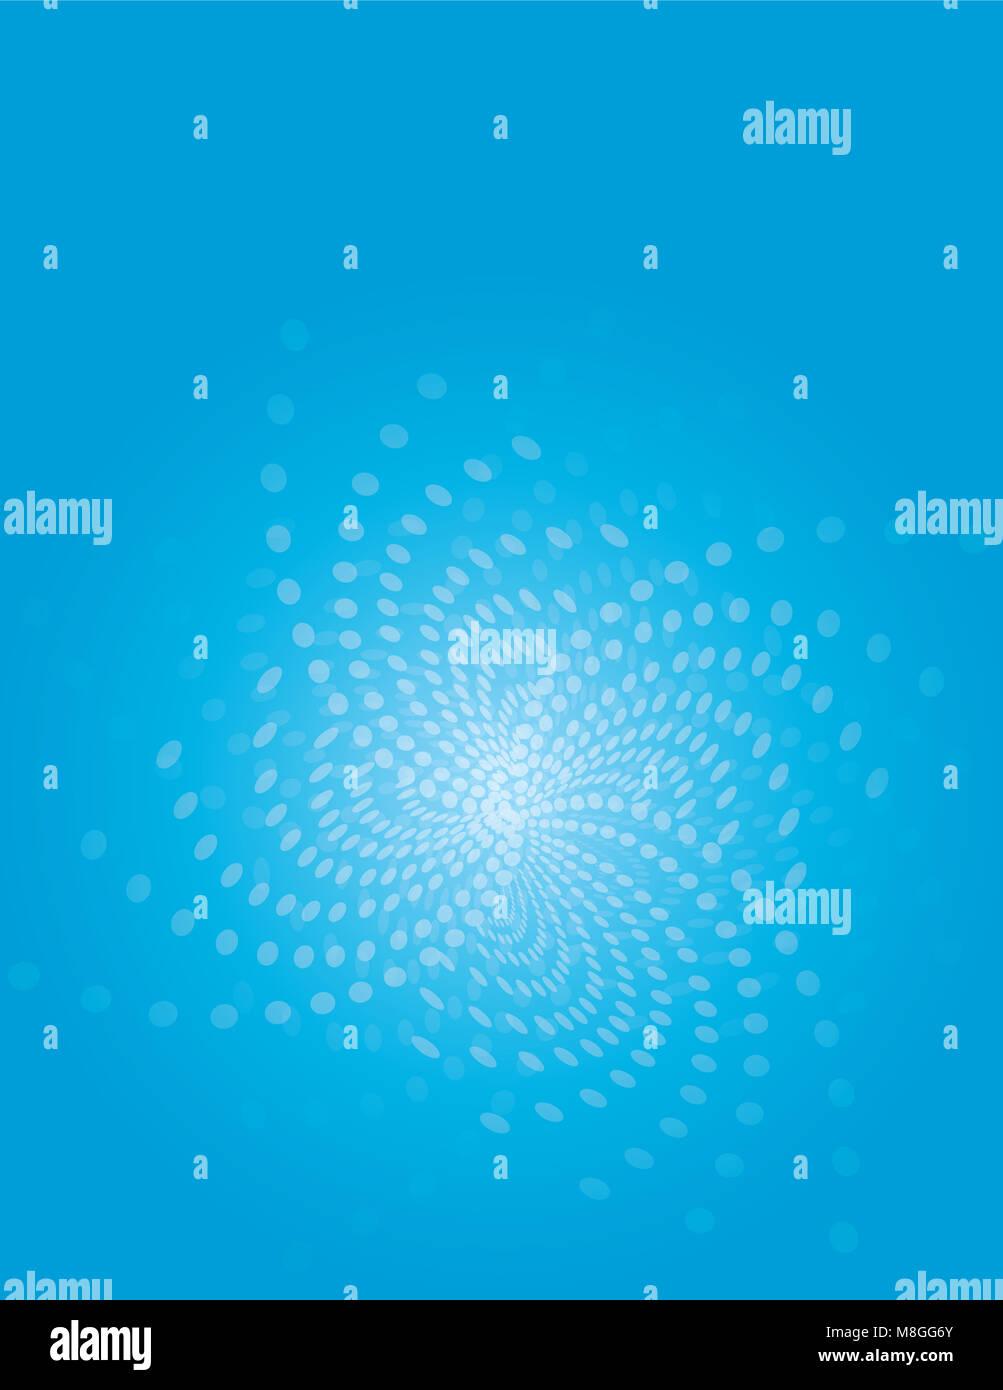 Blue flower swirl flair background - Stock Image